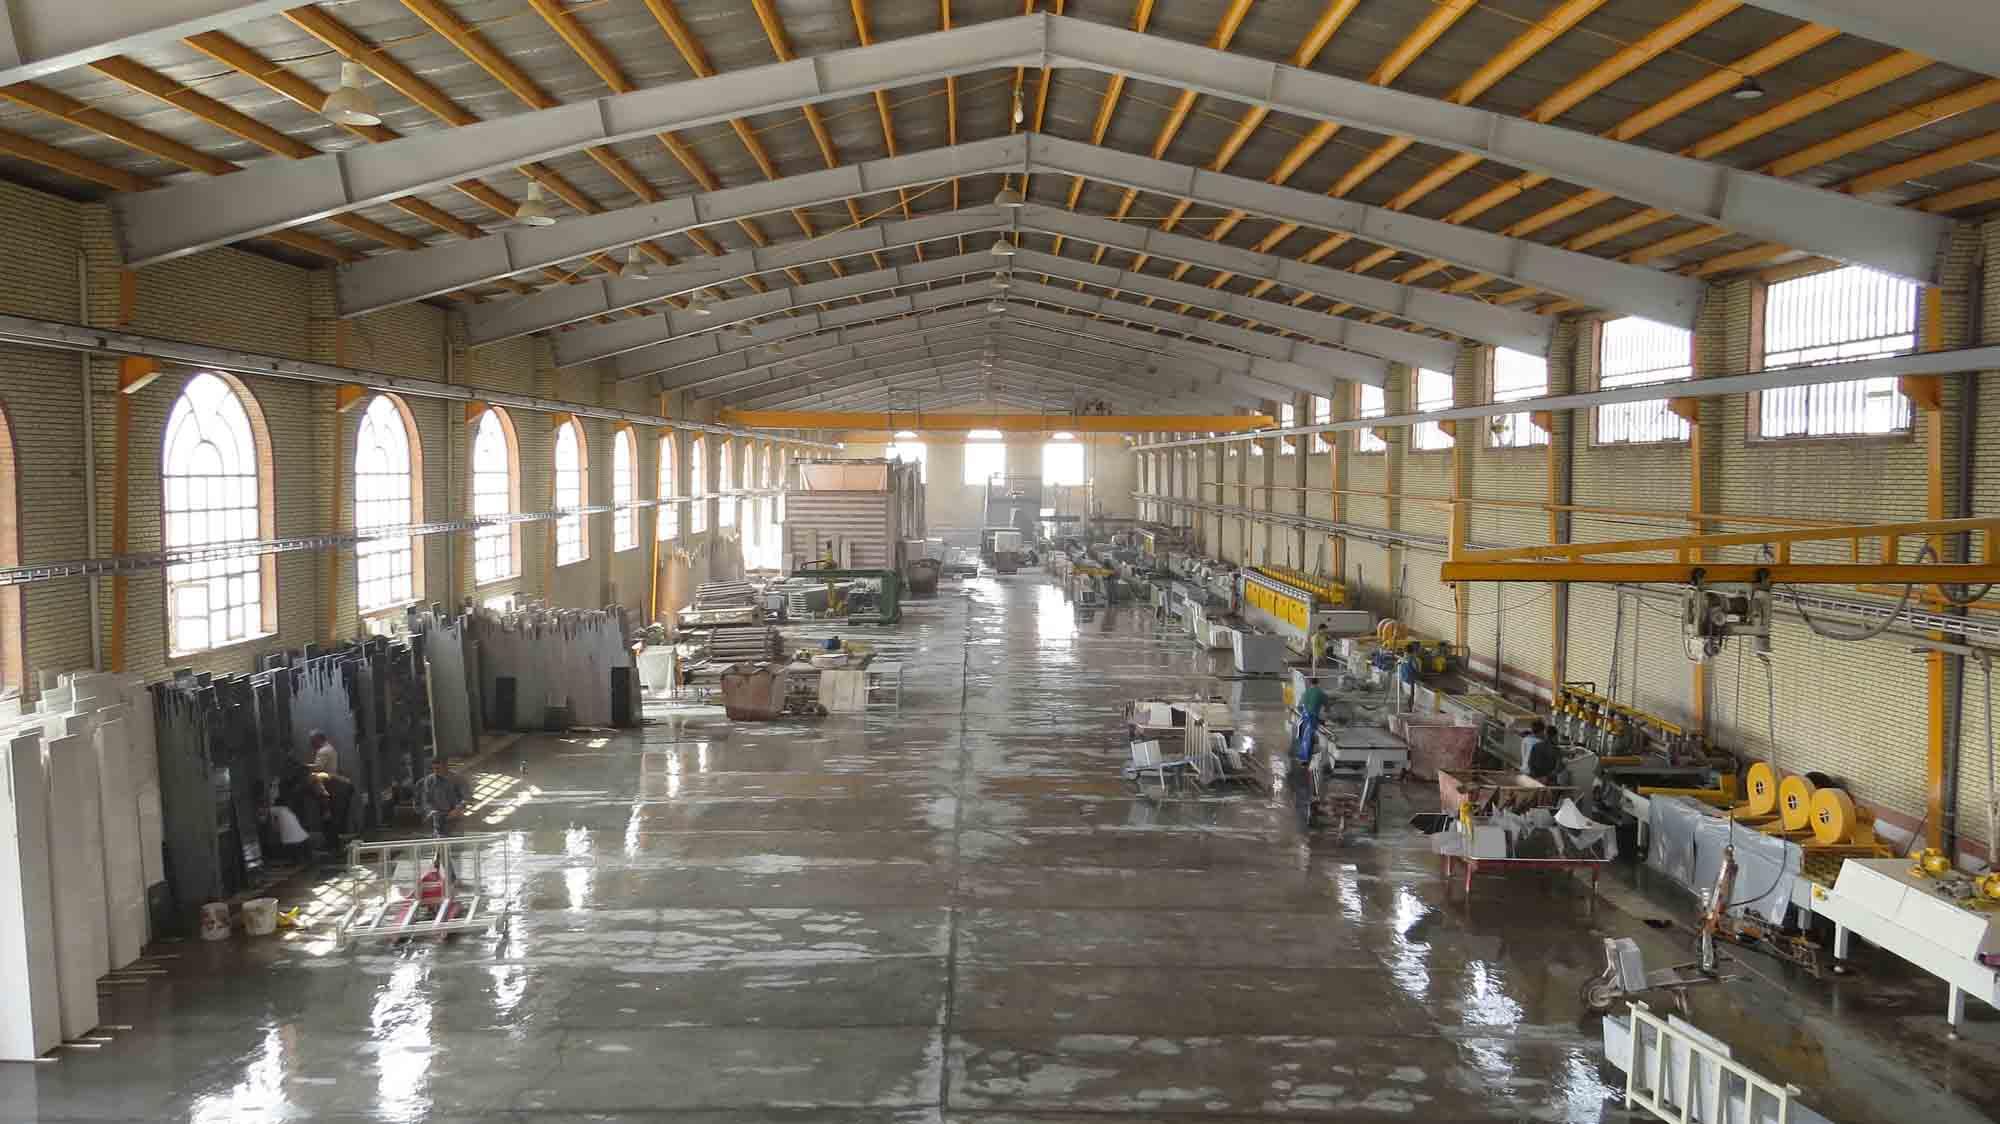 Marvelous stone companys factory